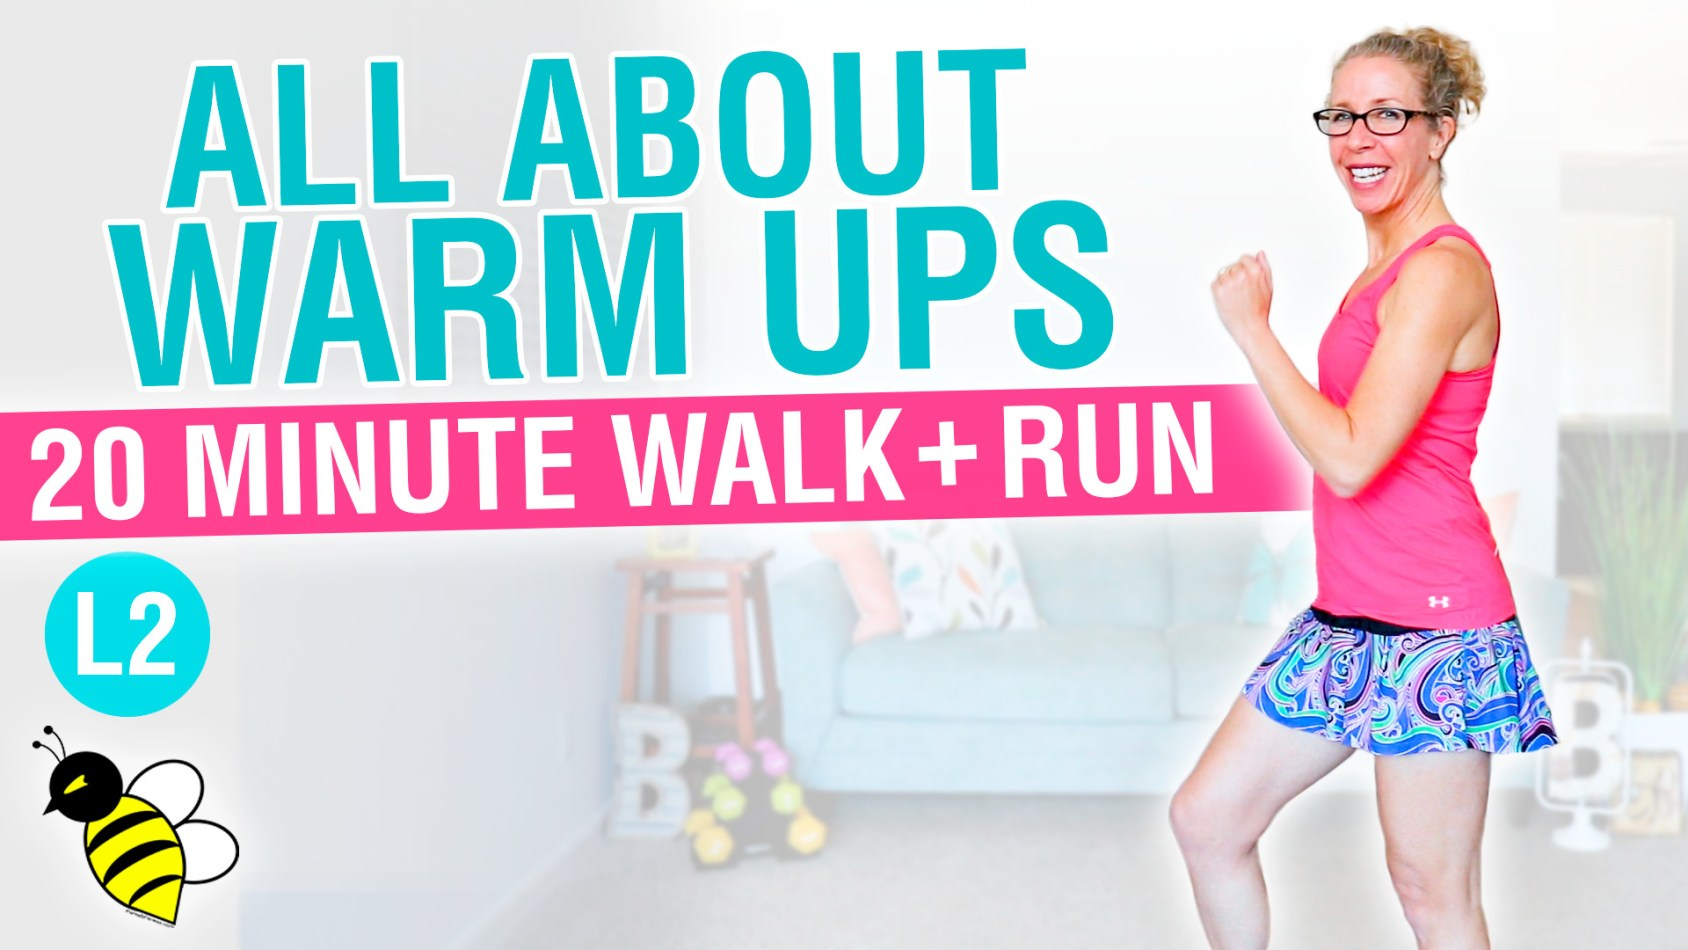 All about WARM UPS 20 minute WALK + RUN workout